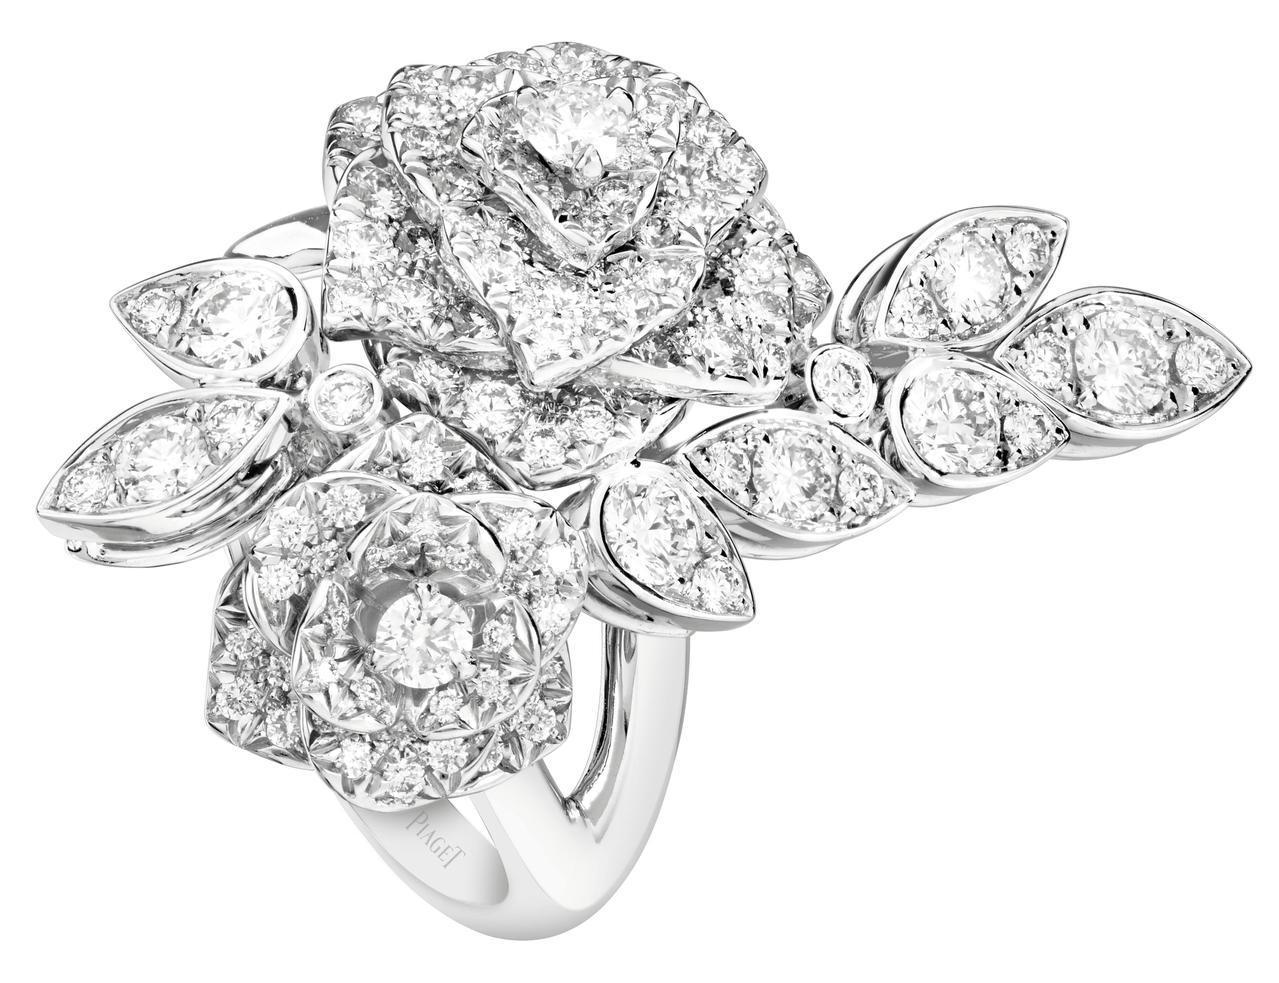 Piaget Rose系列指環,18K白金鑲嵌165顆圓形美鑽共約2.46克拉,...